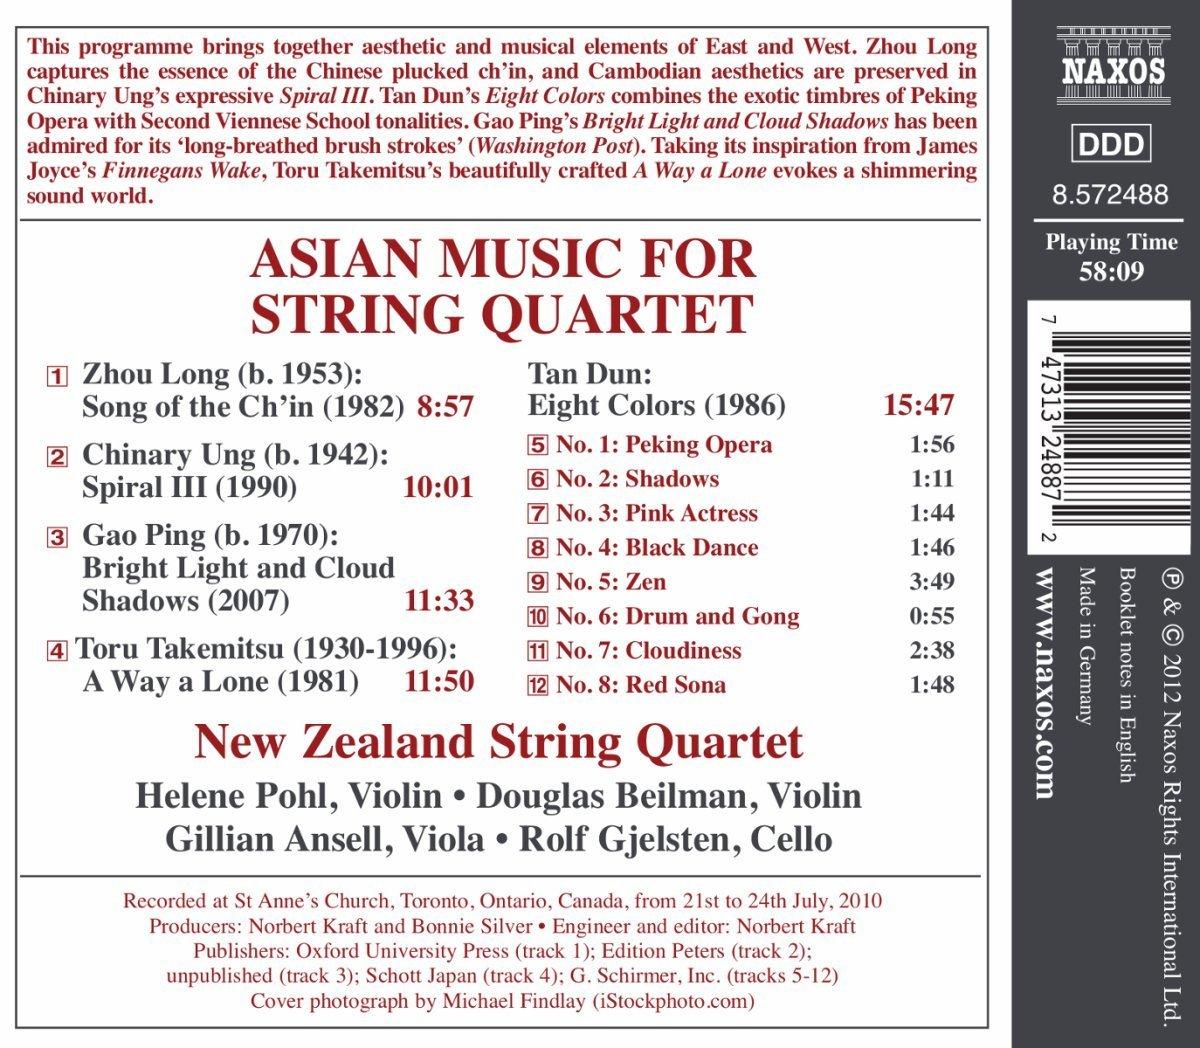 Asian Music for String Quartet by New Zealand String Quartet image